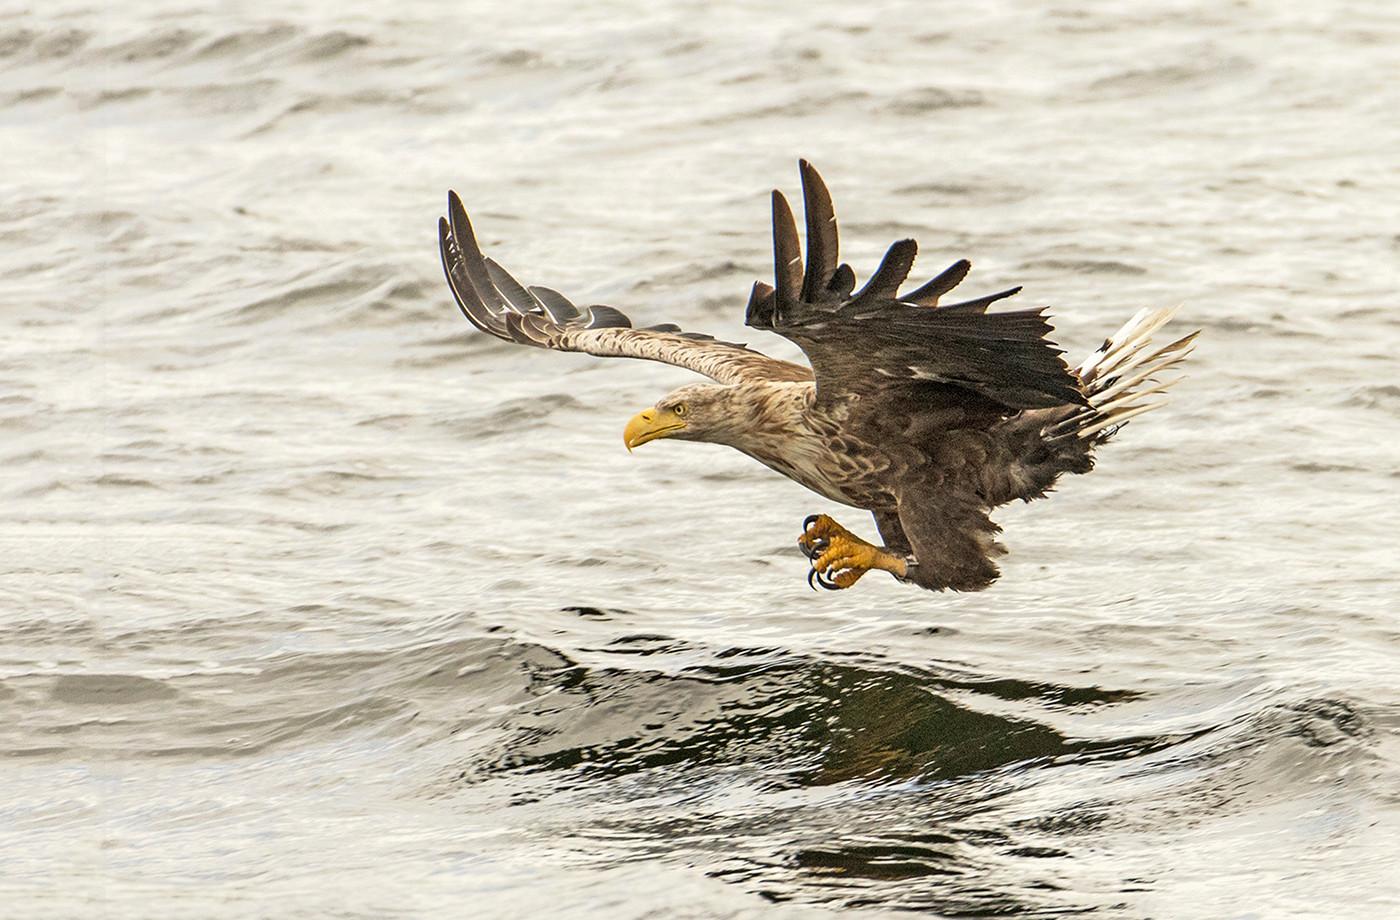 19 WHITE TAILED SEA EAGLE by Glenn Welch